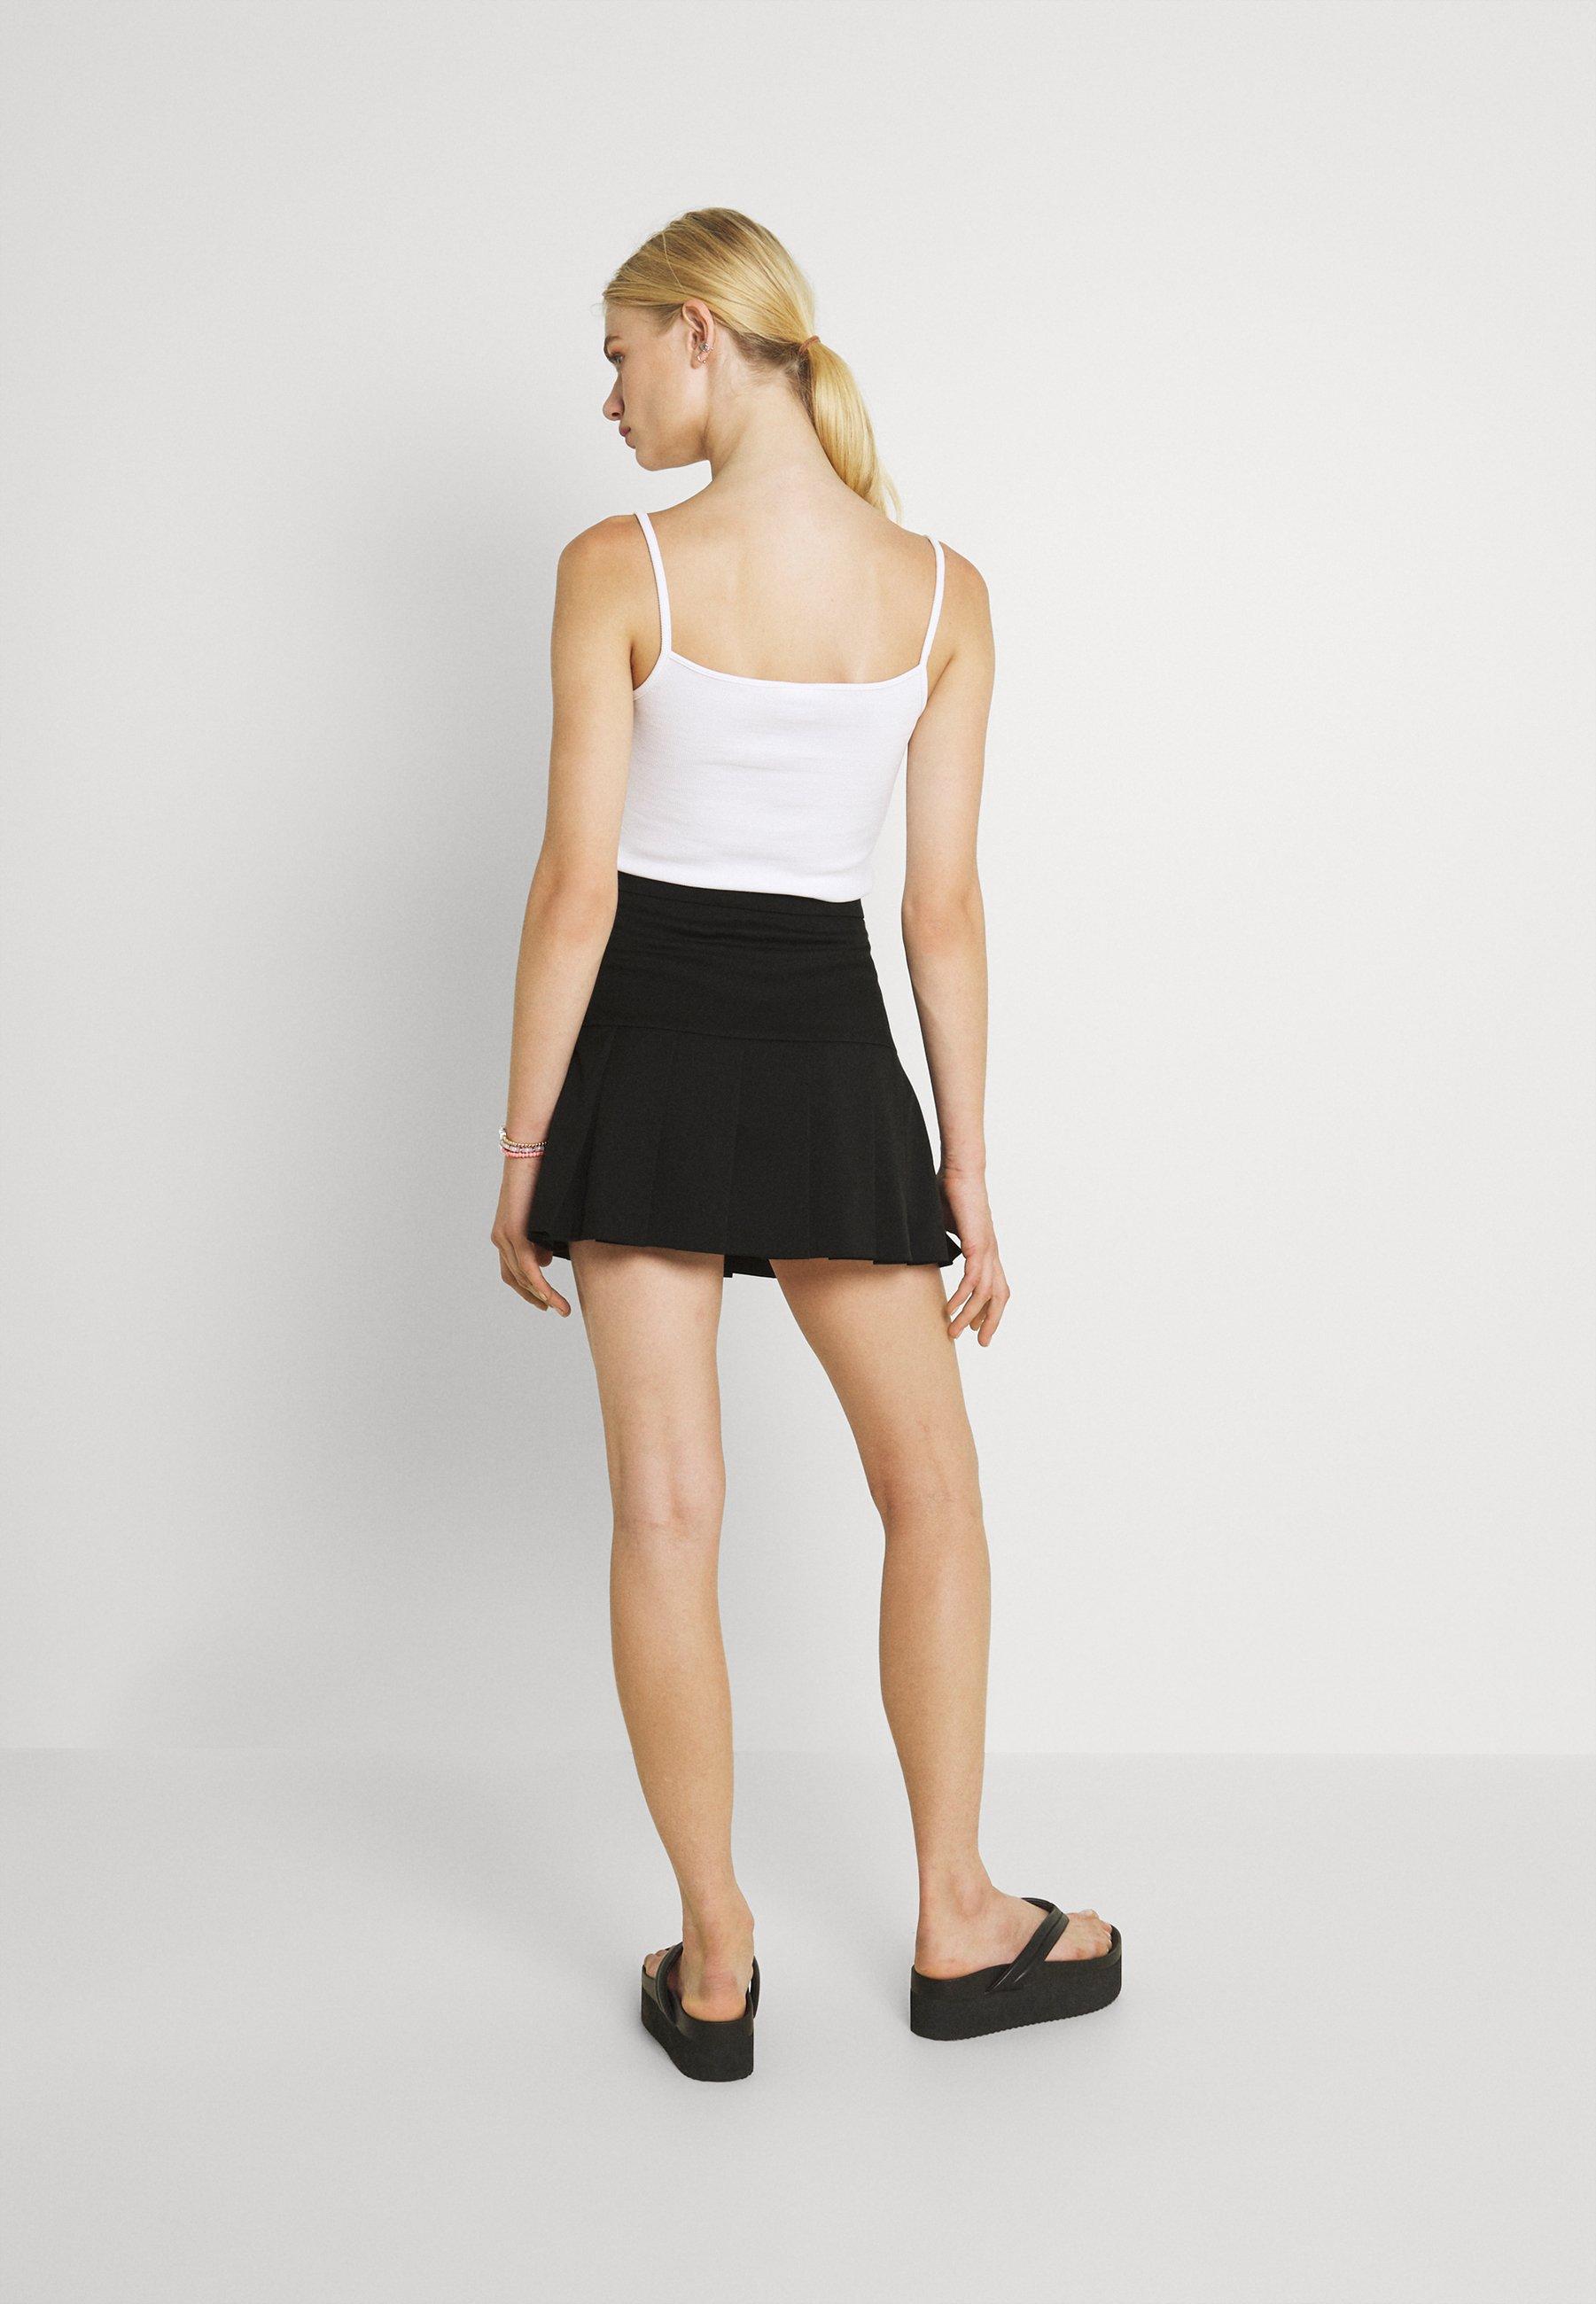 Femme PARIS SHORT SKIRT - Minijupe